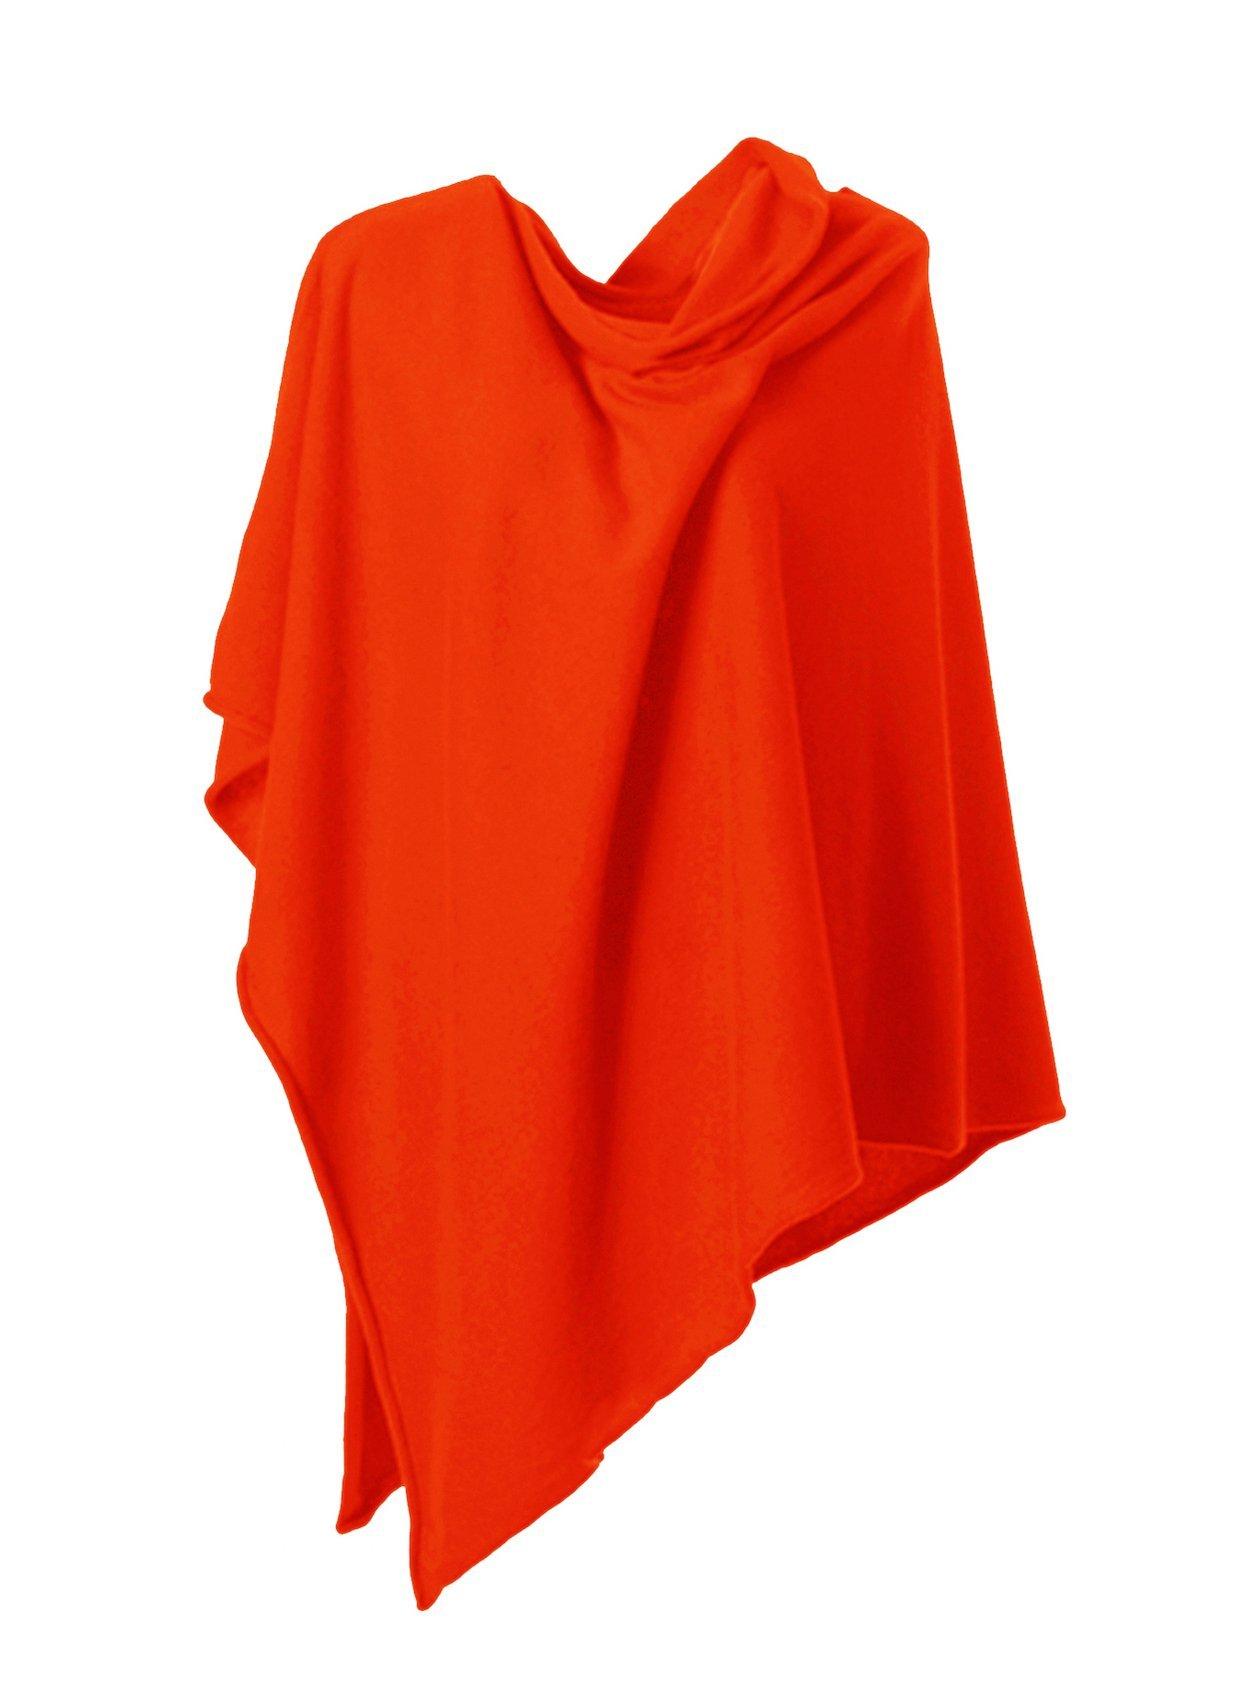 Anna Kristine Asymmetrical 100% Cashmere Draped Poncho Dress Topper - Sunrise Orange